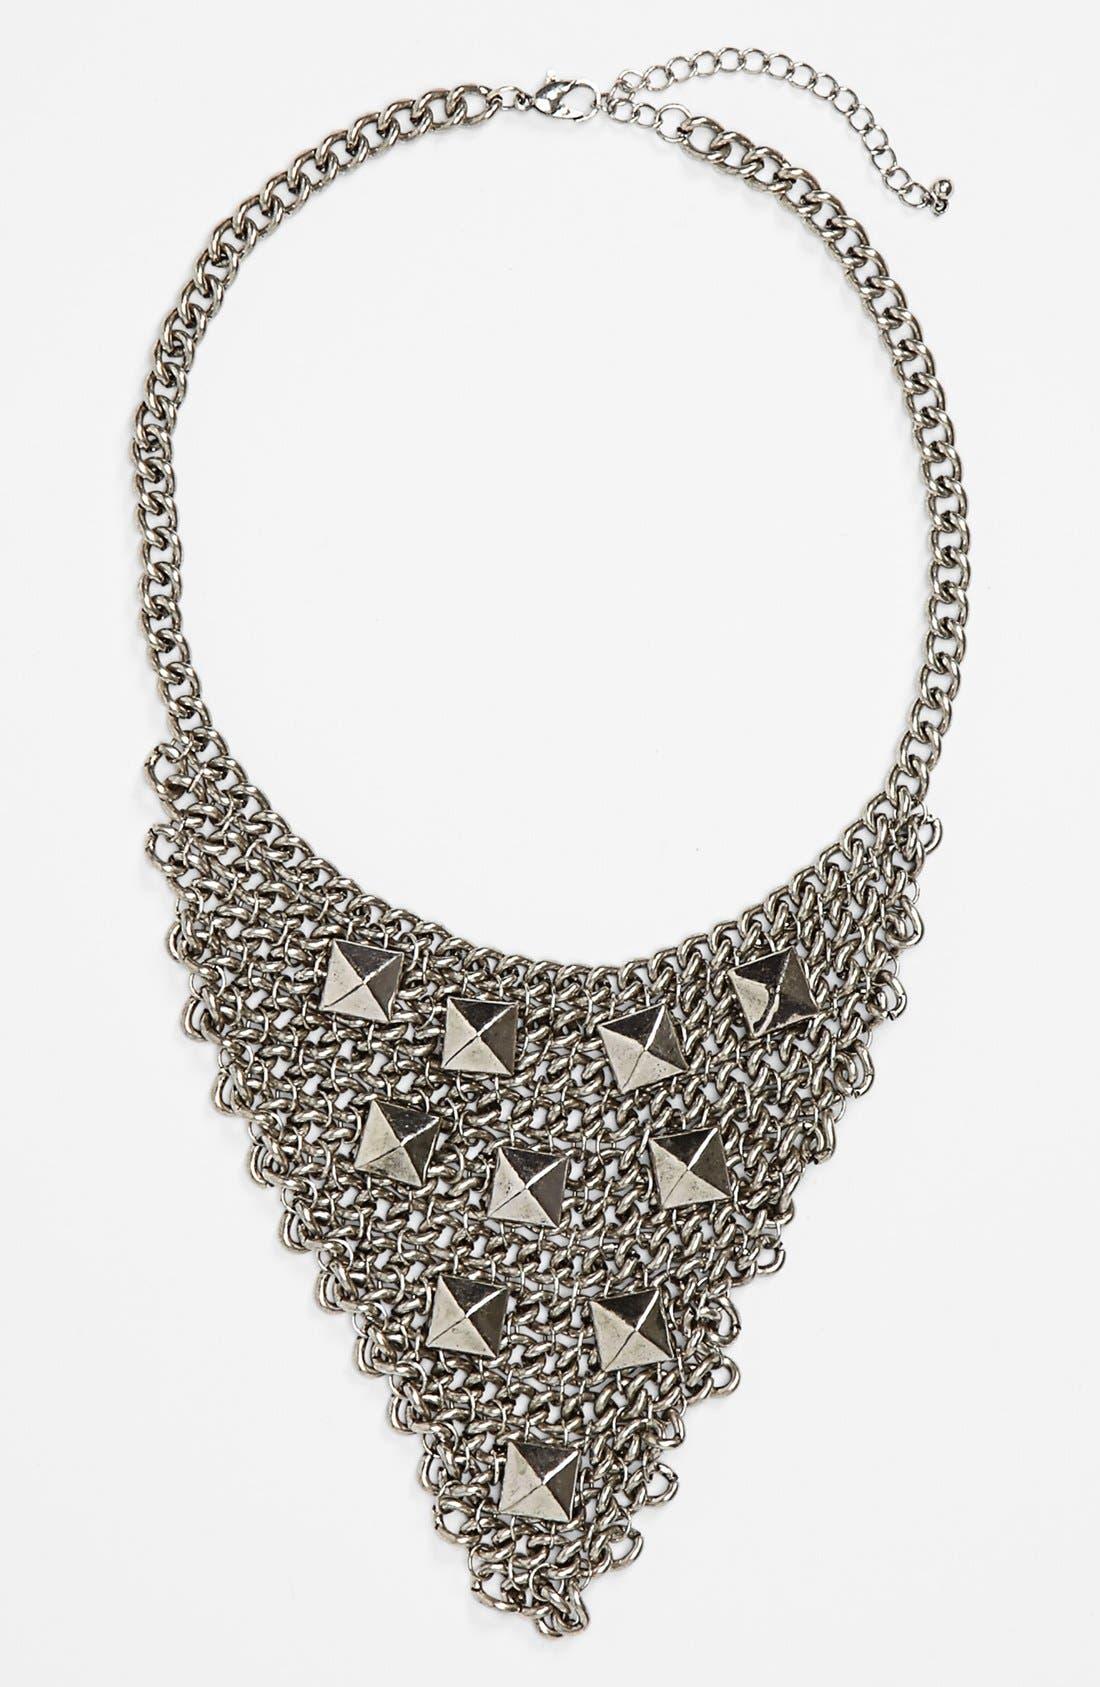 Main Image - Orion Chain Bib Necklace